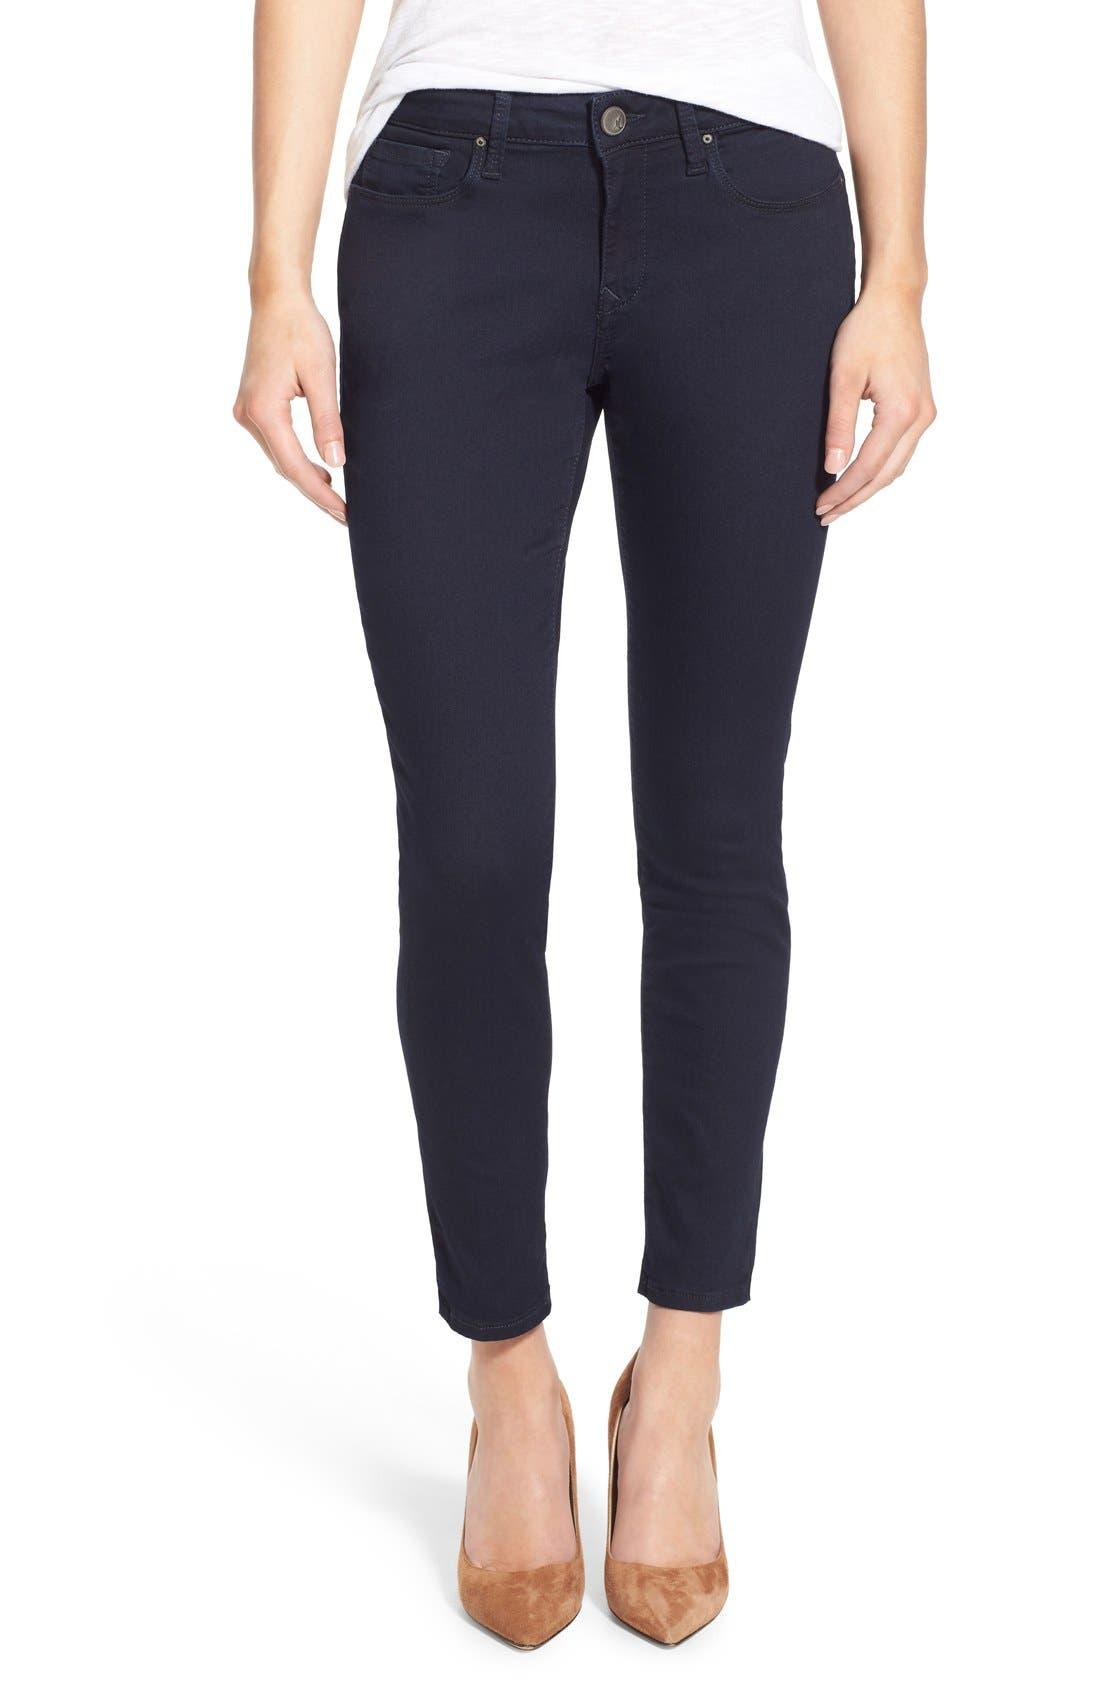 Main Image - Mavi Jeans 'Alexa' Stretch Skinny Jeans (Dark Shanti) (Petite)